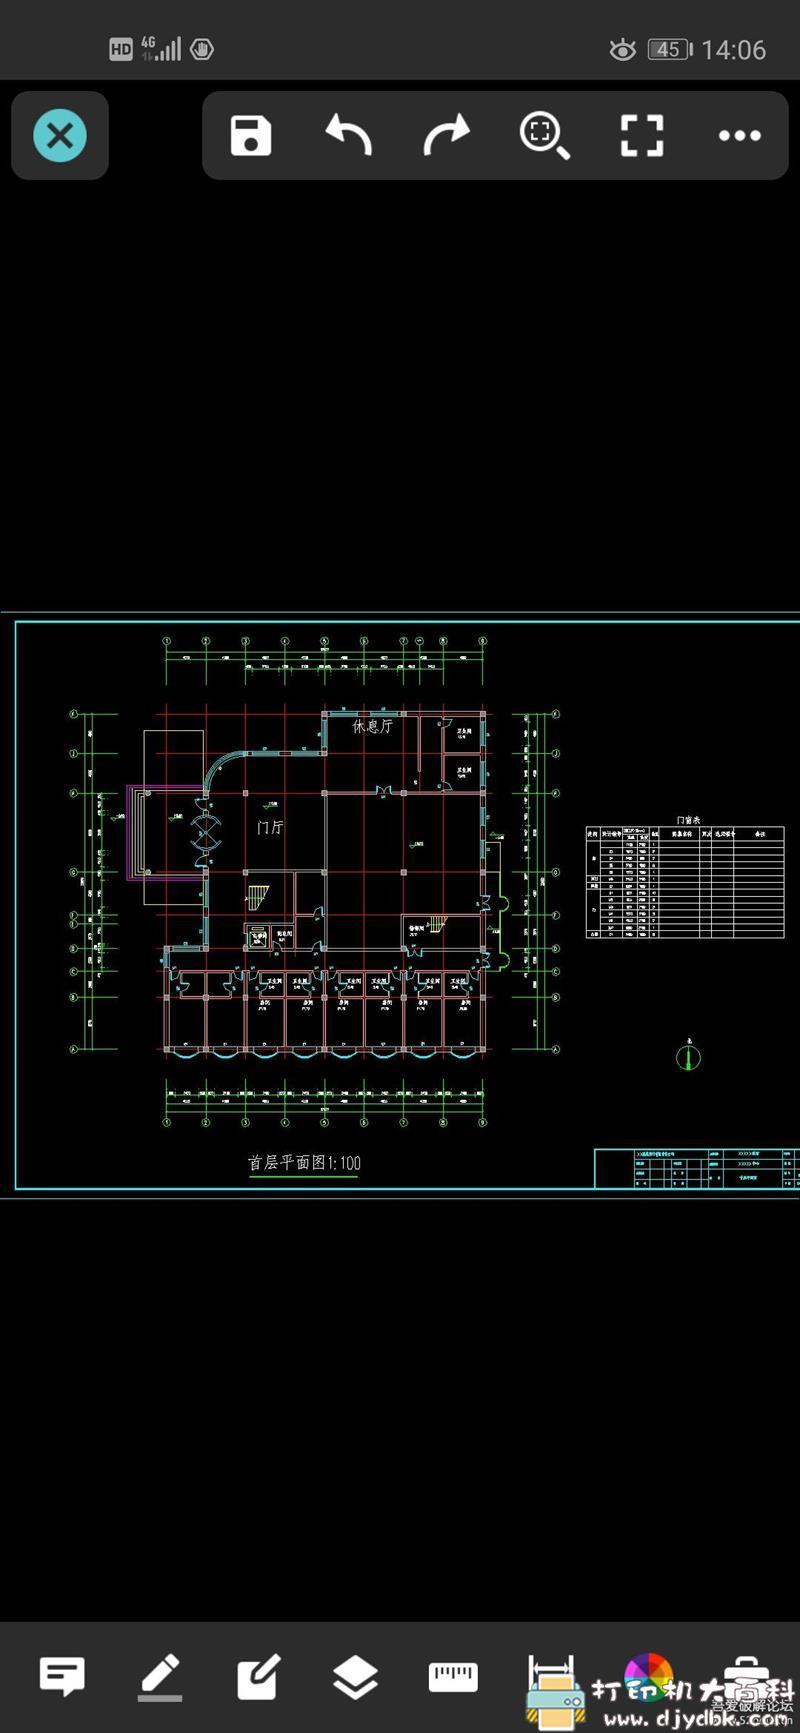 [Android]浩辰CAD看图王 v3.9.2 高级版(附电脑看图及转换器)图片 No.2